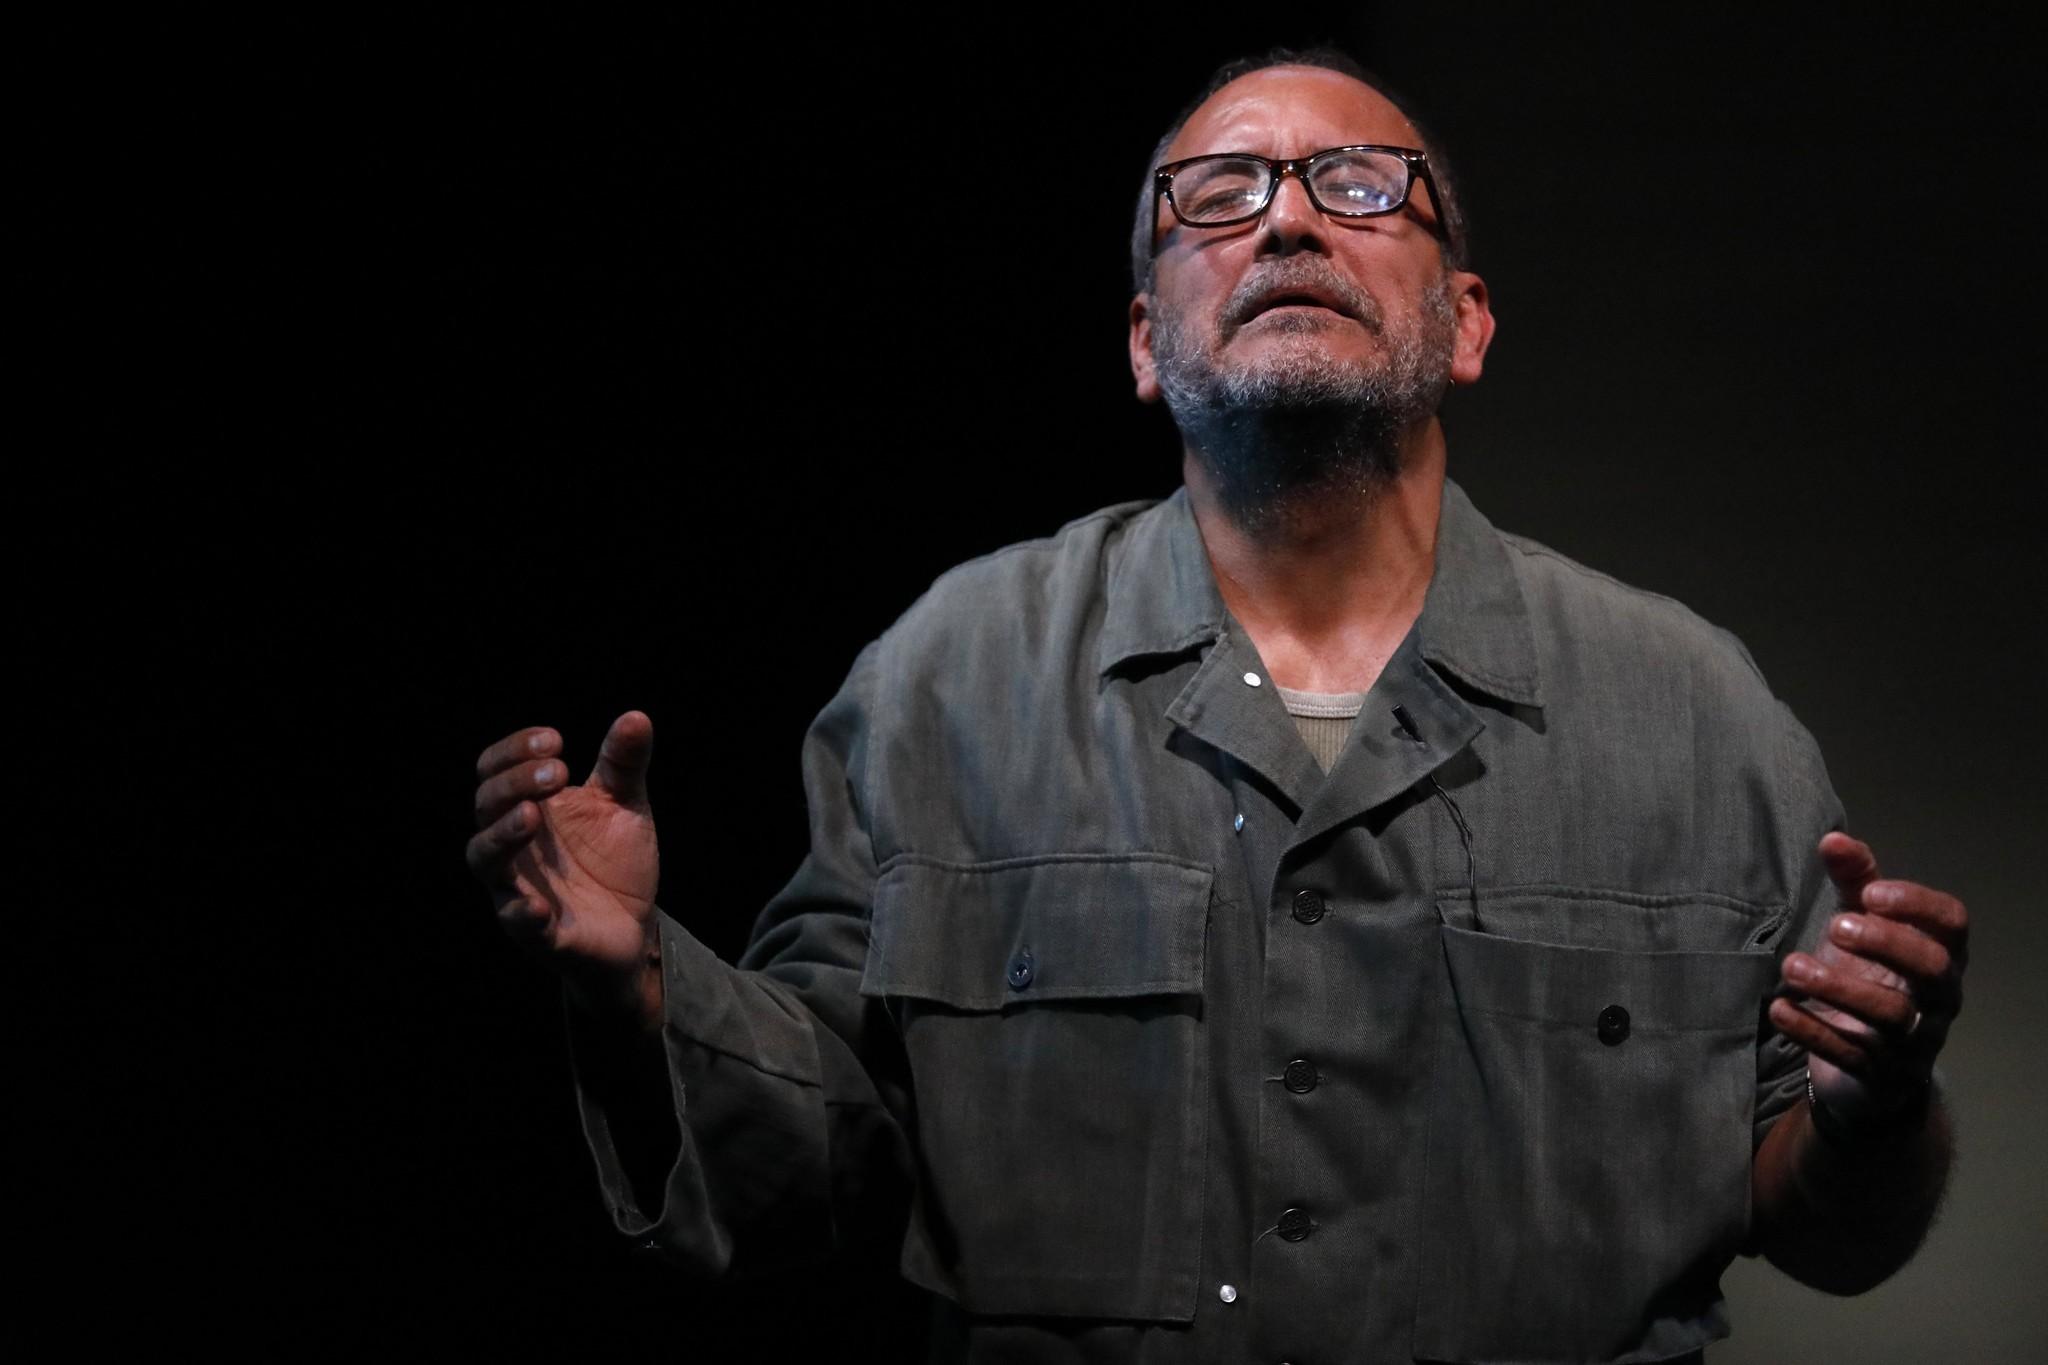 CULVER CITY, CA - JANAUARY 26, 2018 - Ruben Garfias, as Grandpop, performs in Pulitzer Prize winning